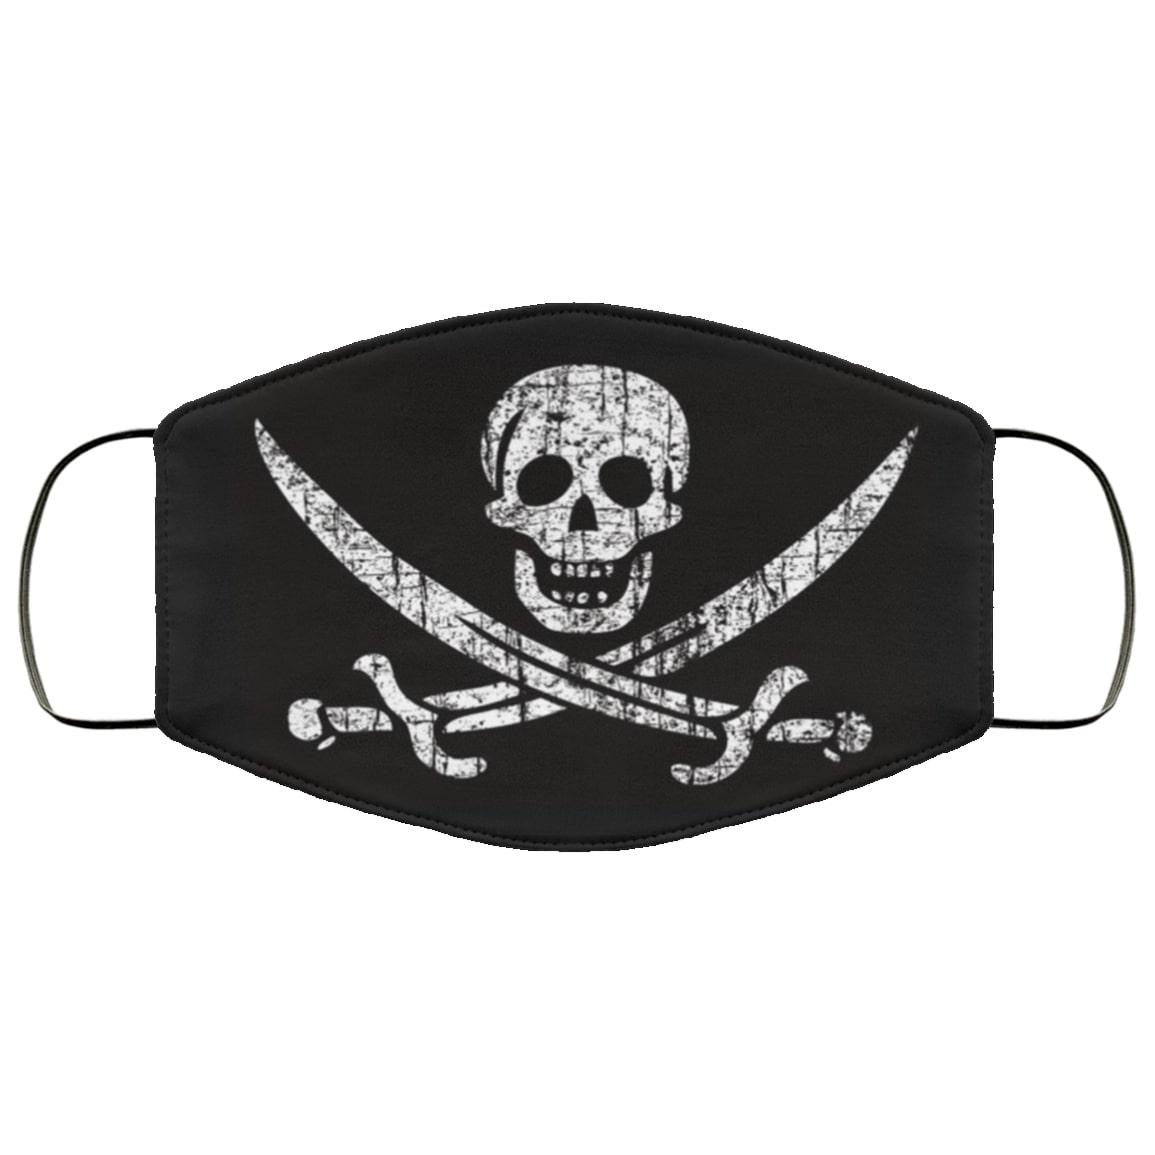 Pirate flags jack captain skull sword full over printed face mask 4